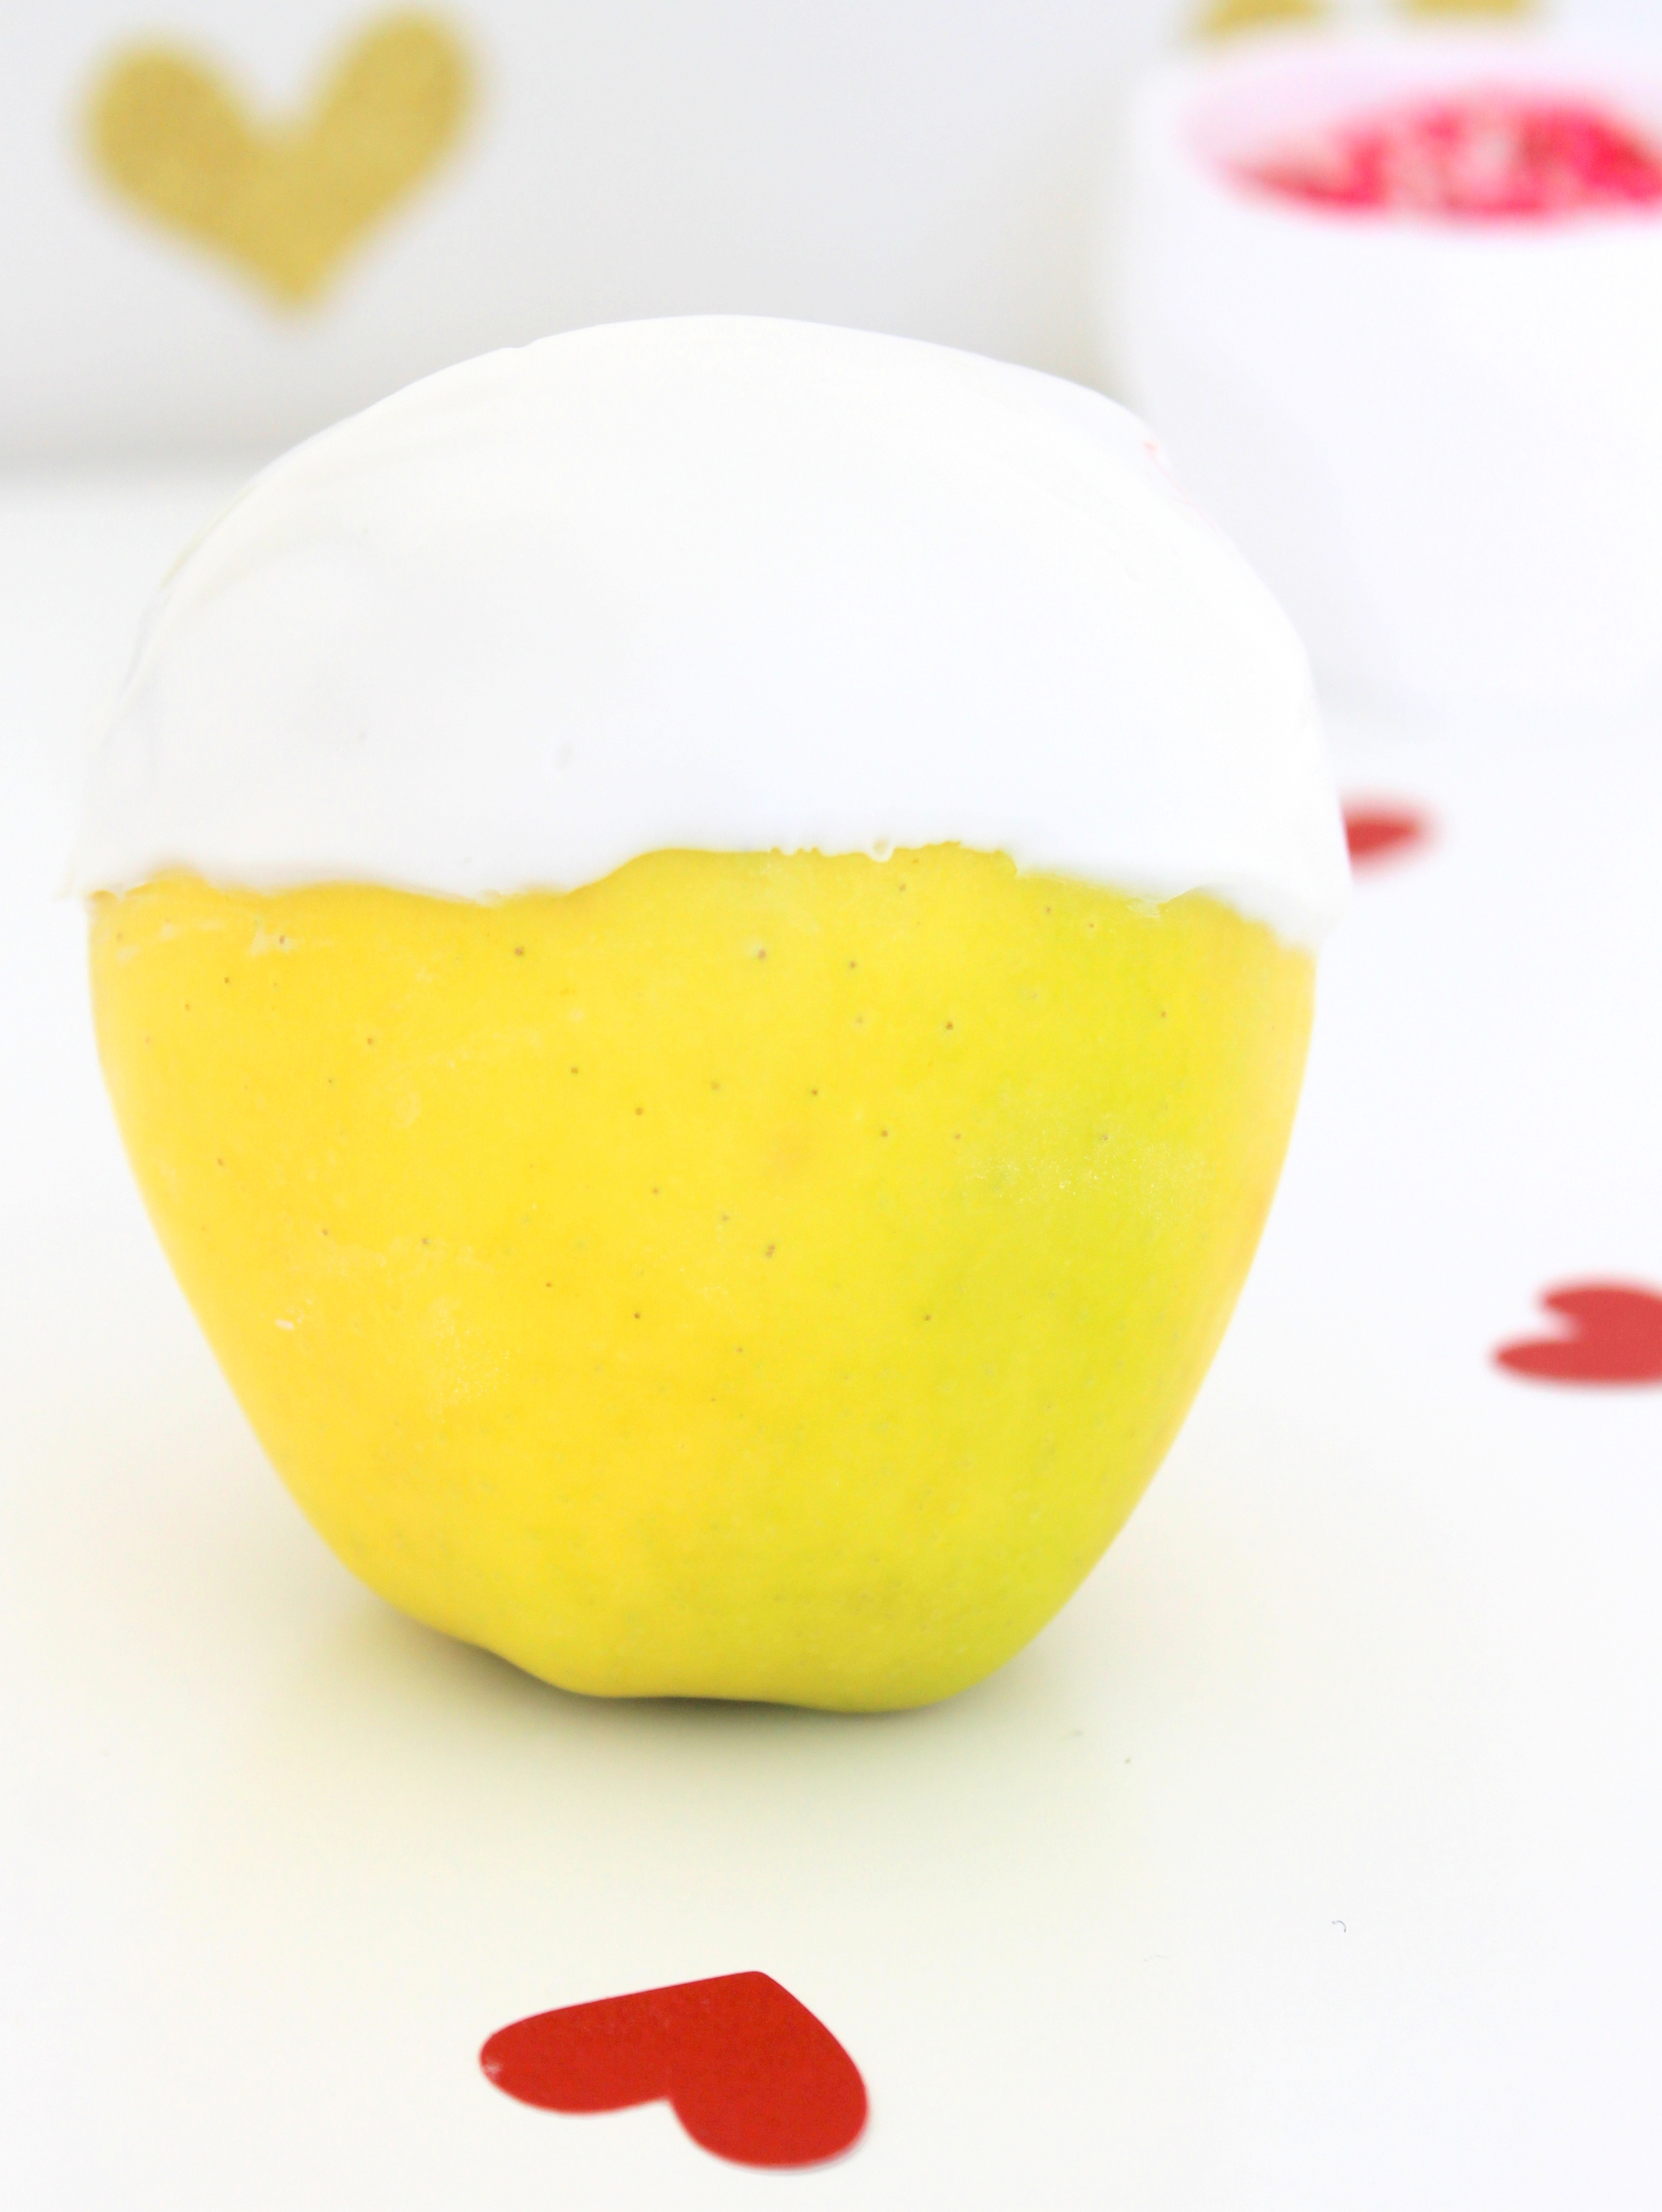 DIY Valentine's Day Apple Apple with White Chocolate